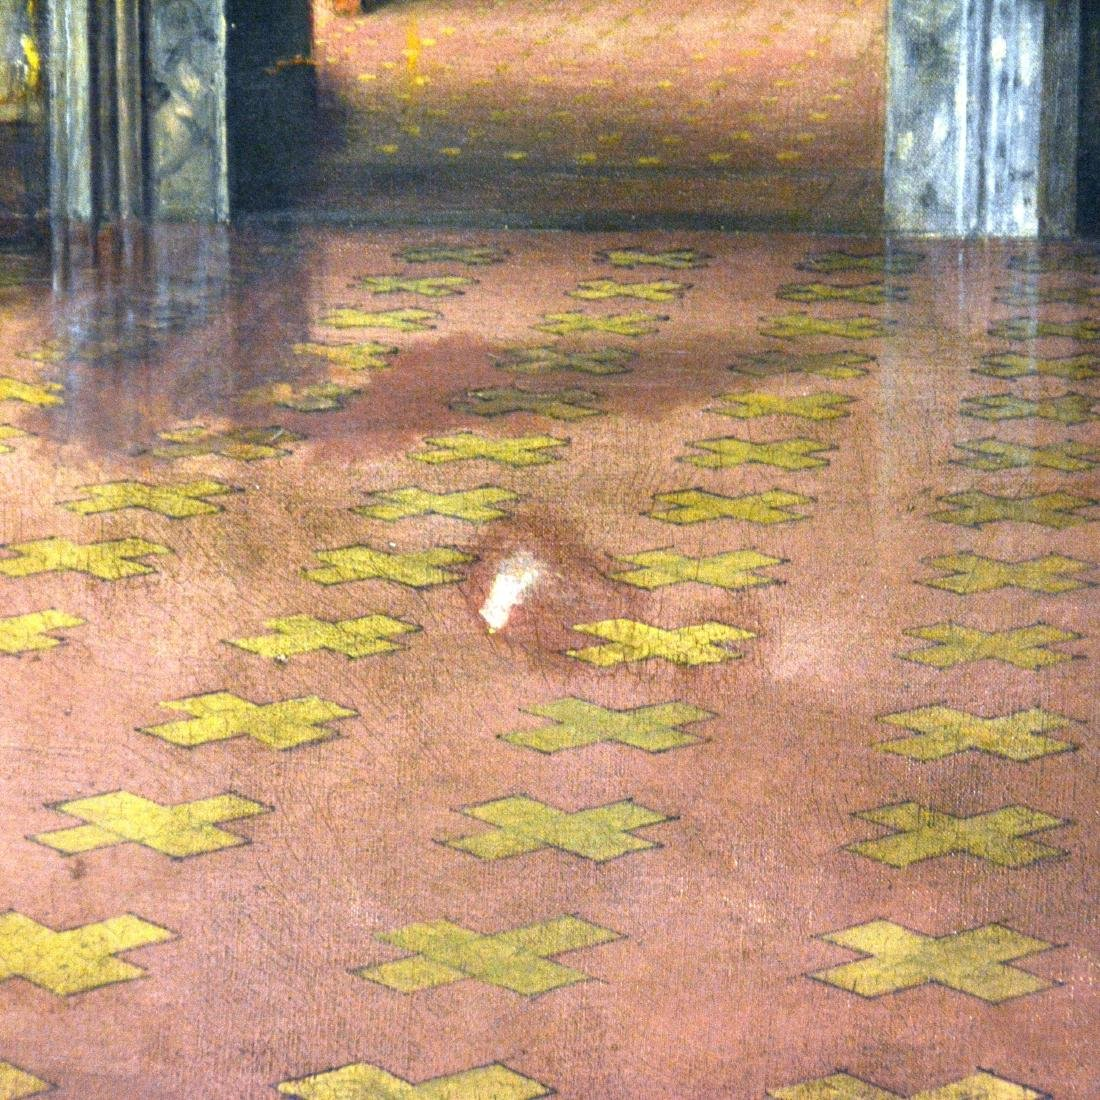 Santi Corsi Painting Interior Pitti Palace - 4